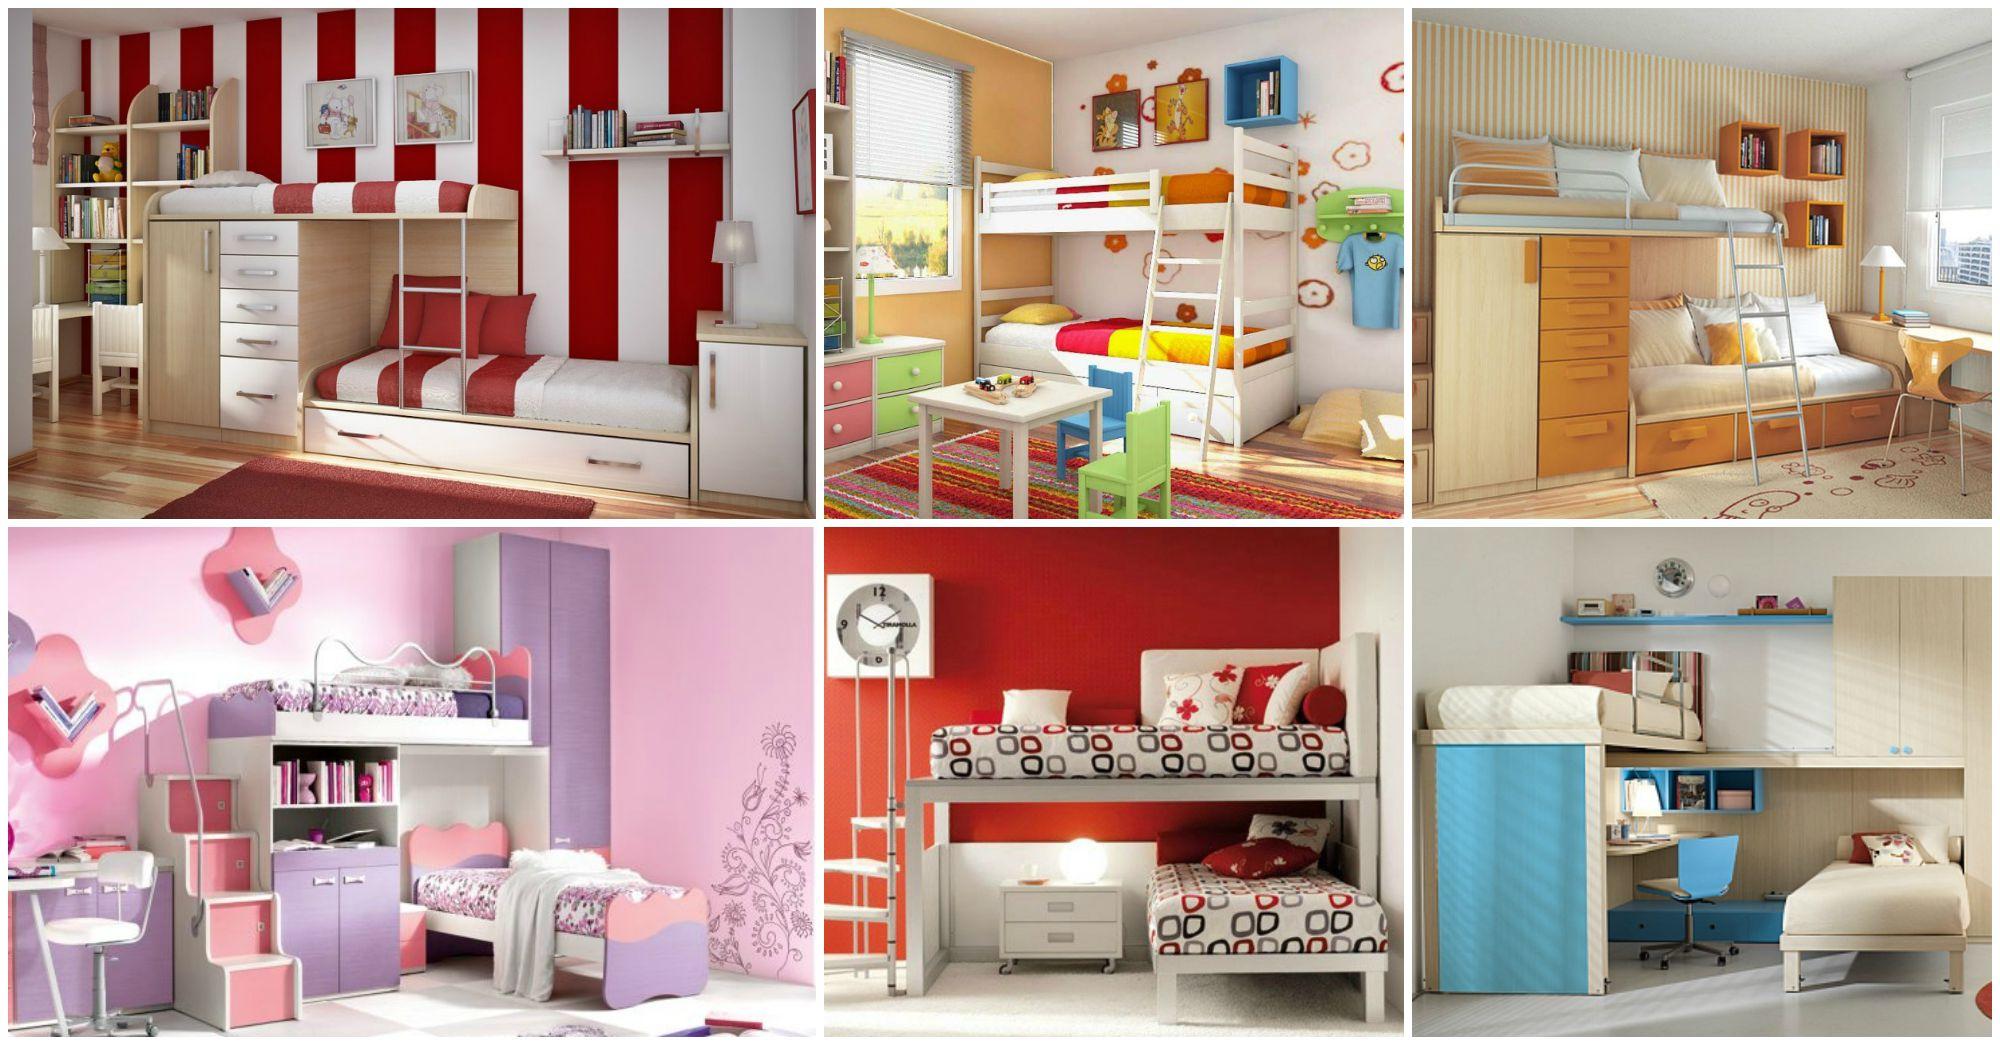 10 Fantastic Small Bedroom Ideas